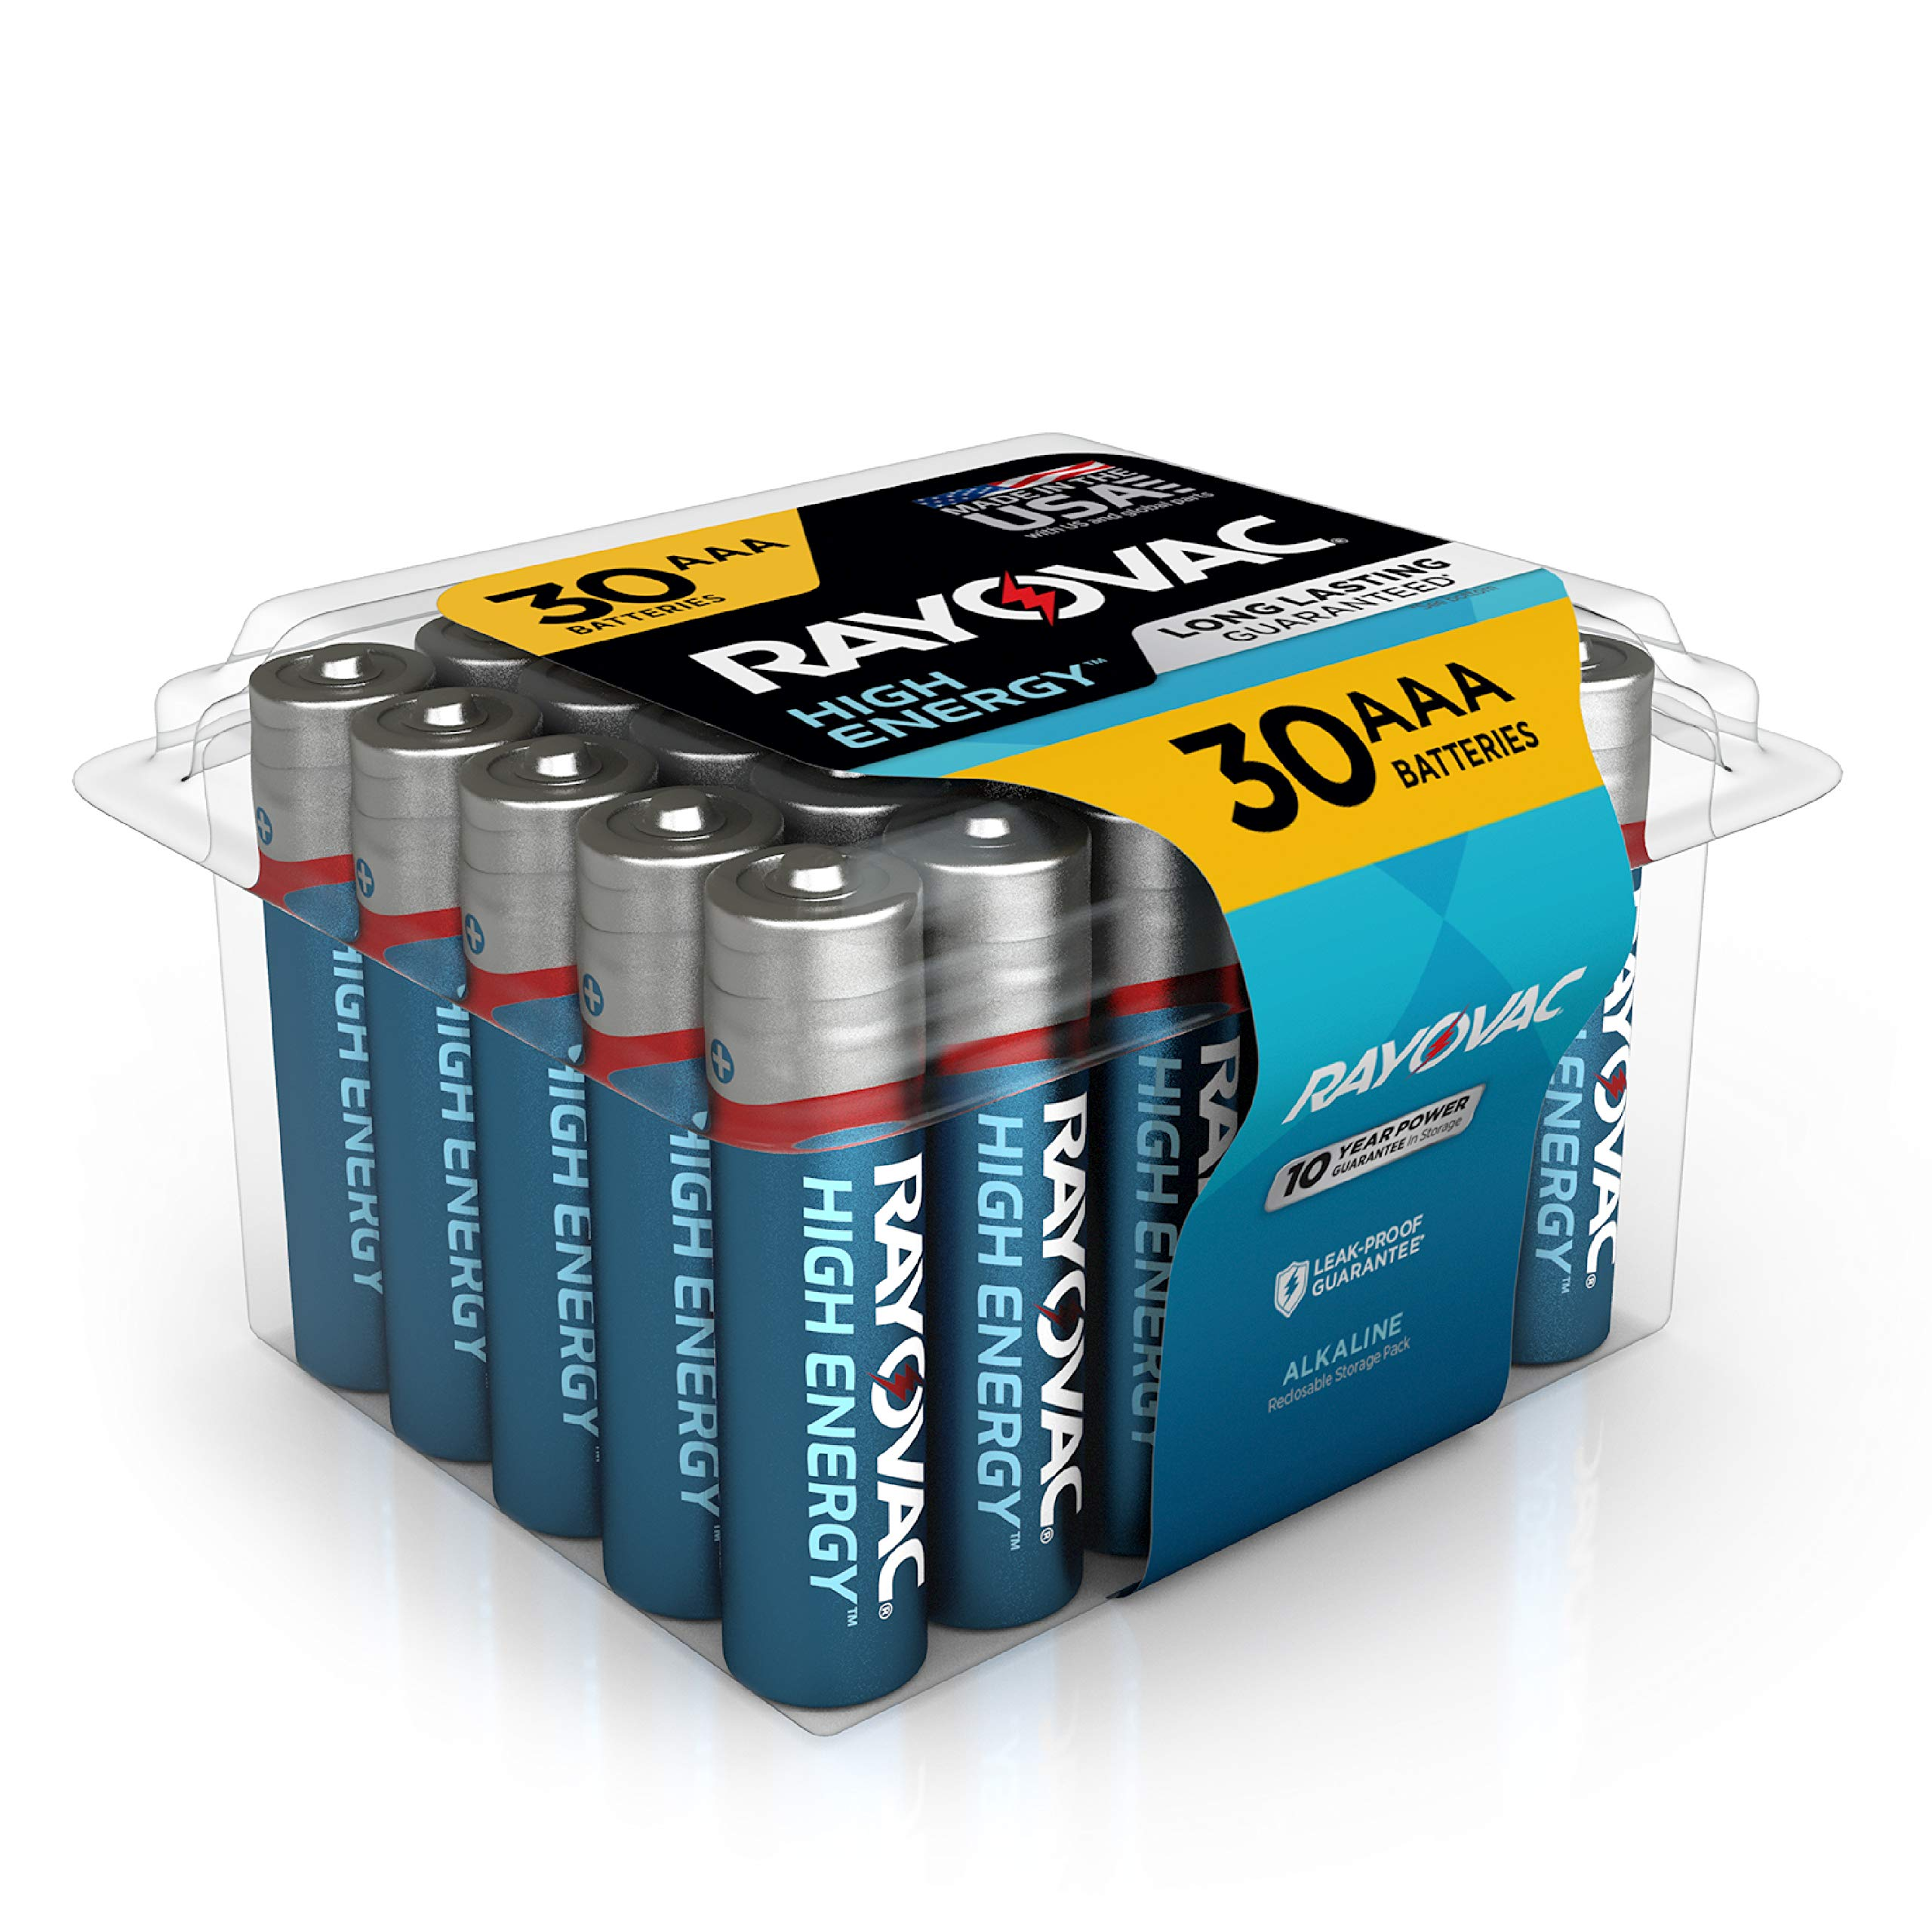 Rayovac AAA Batteries, Alkaline Triple A Batteries (30 Battery Count)